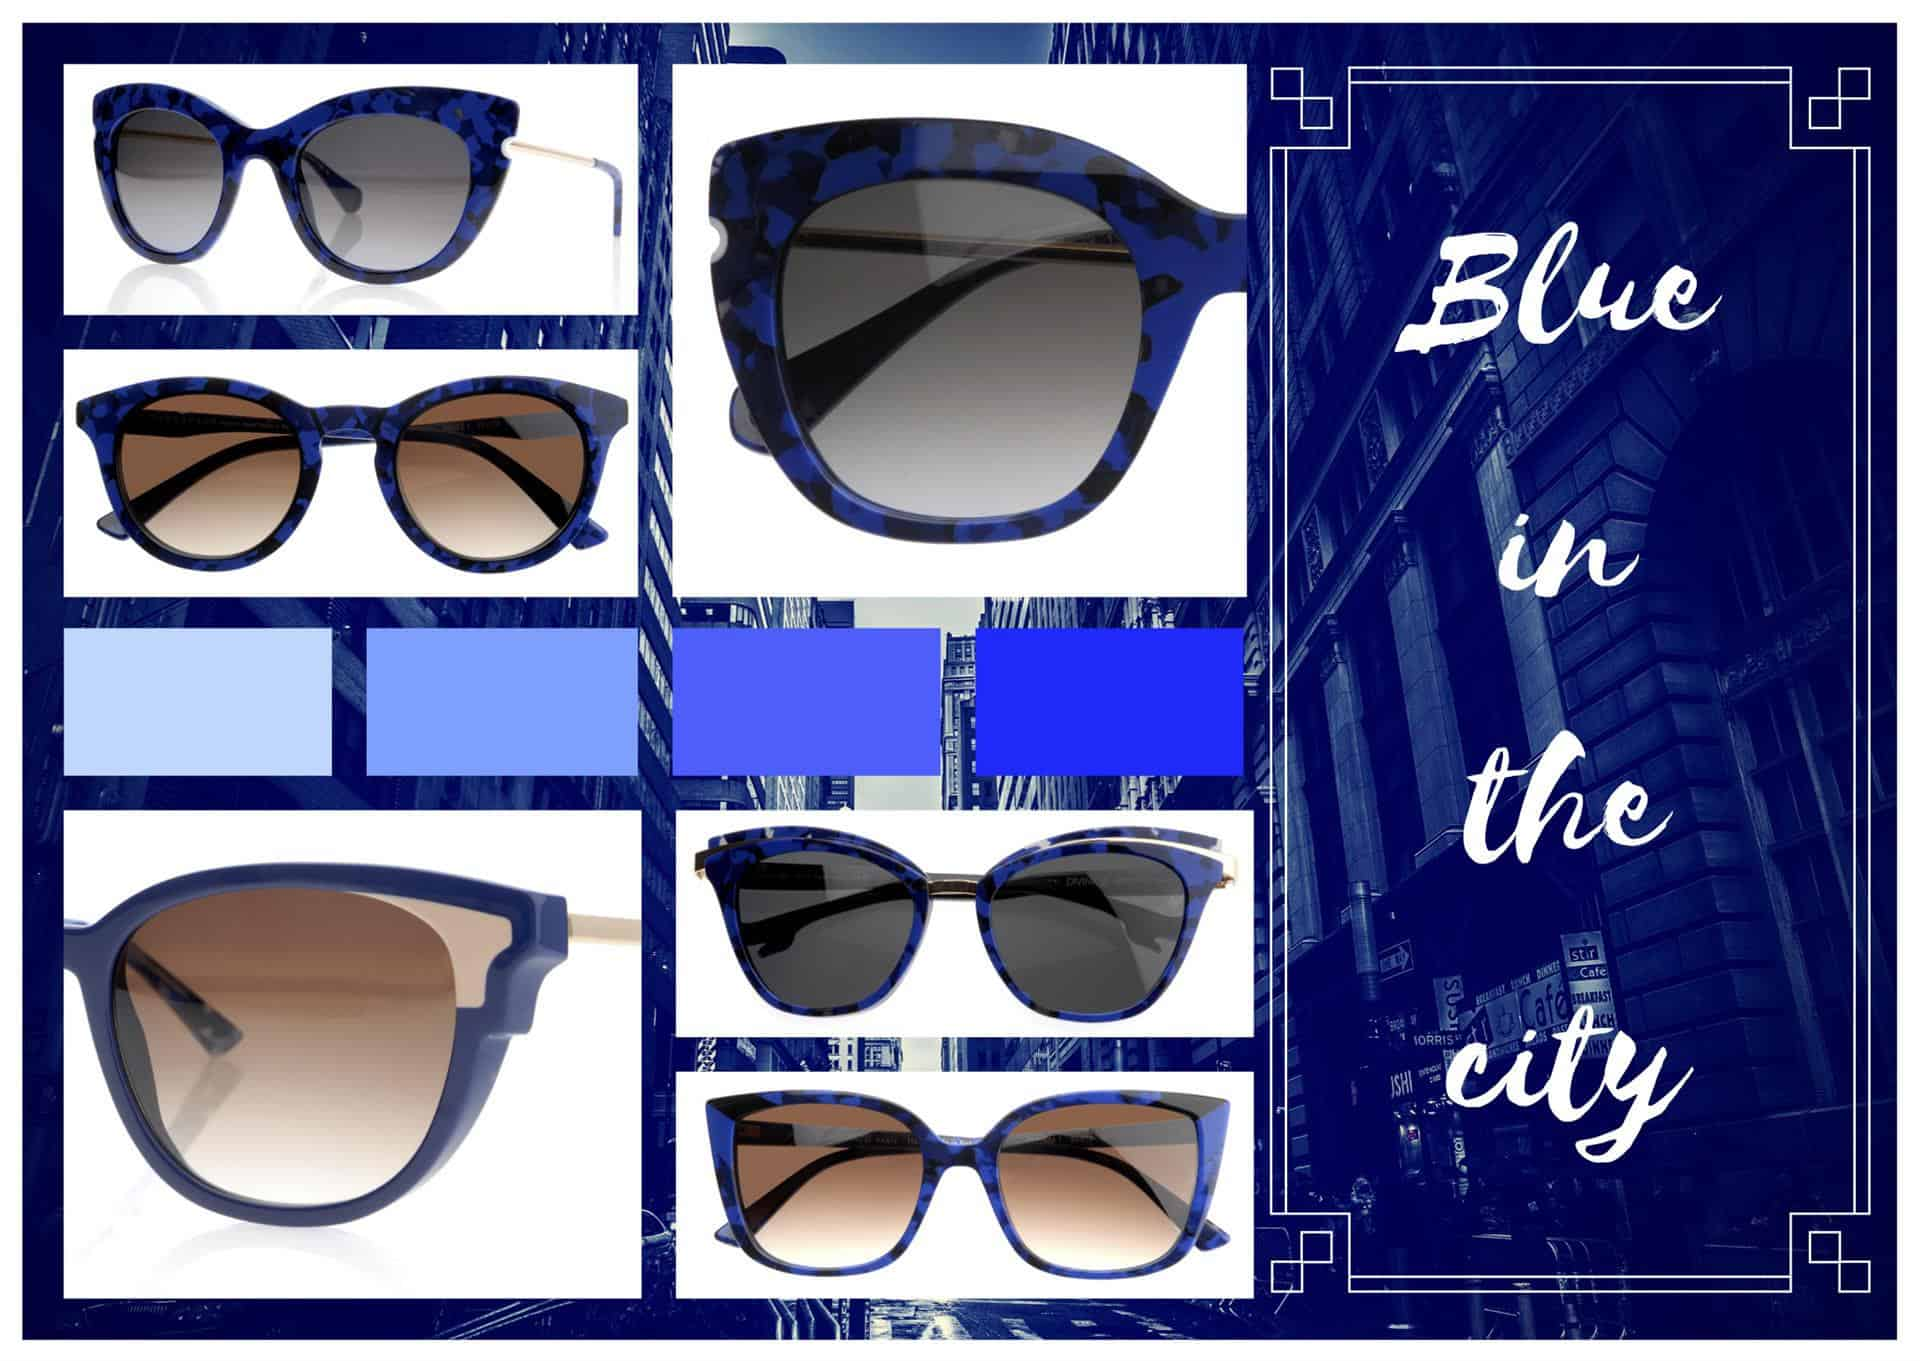 eyewear Face à Face, dove il blu domina incontrastato nelle sue più moderne versioni!